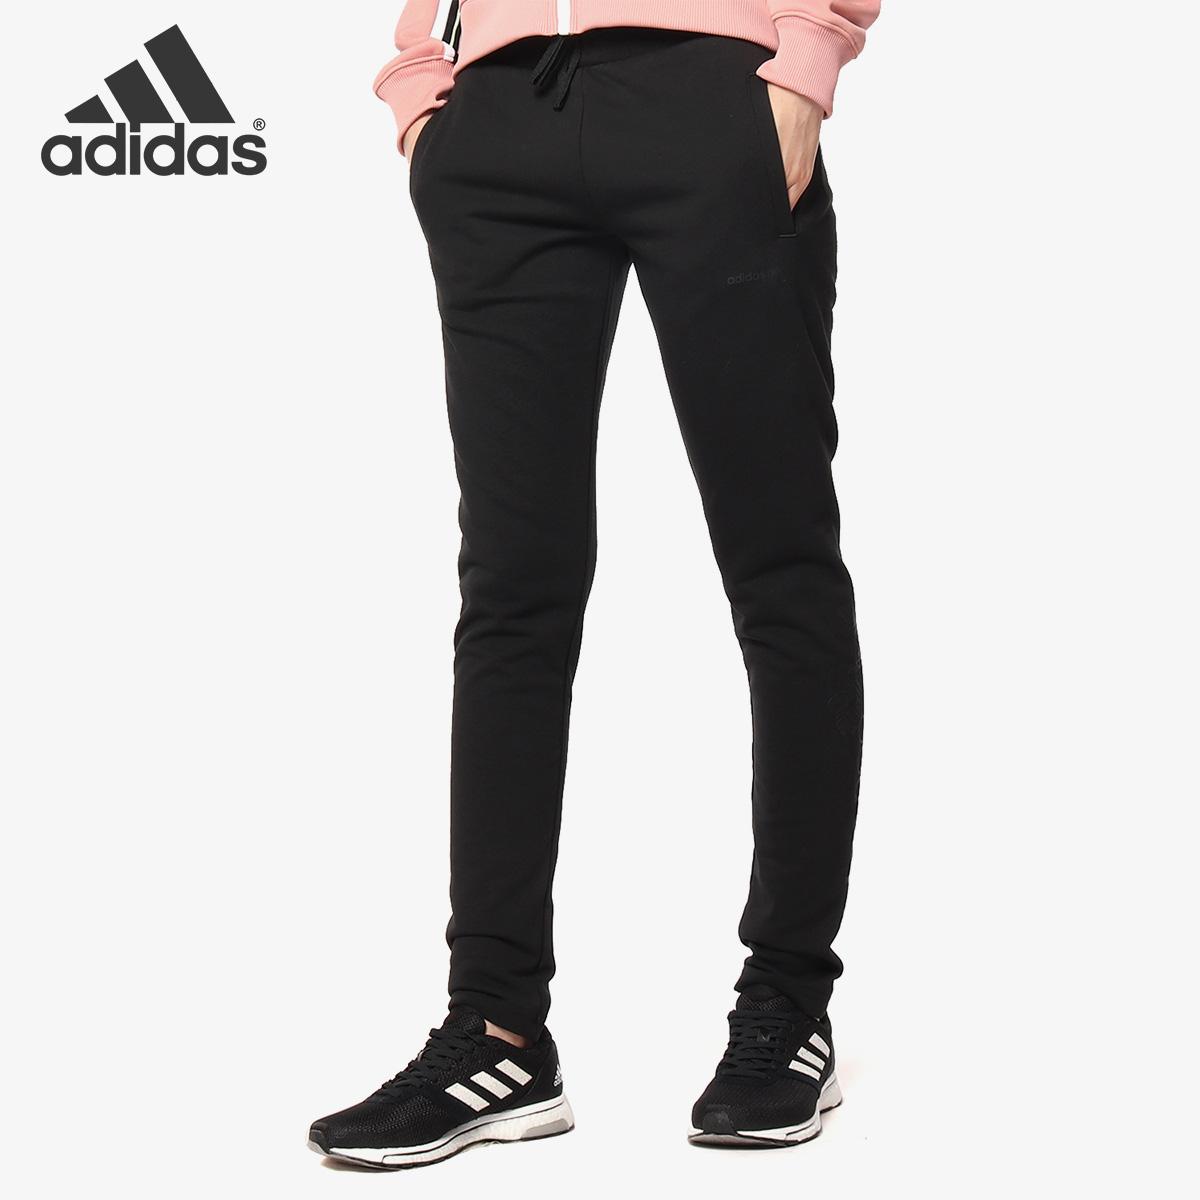 Adidas/阿迪達斯正品 W OS EMBRD TP 女子休閑運動健身長褲DX0046